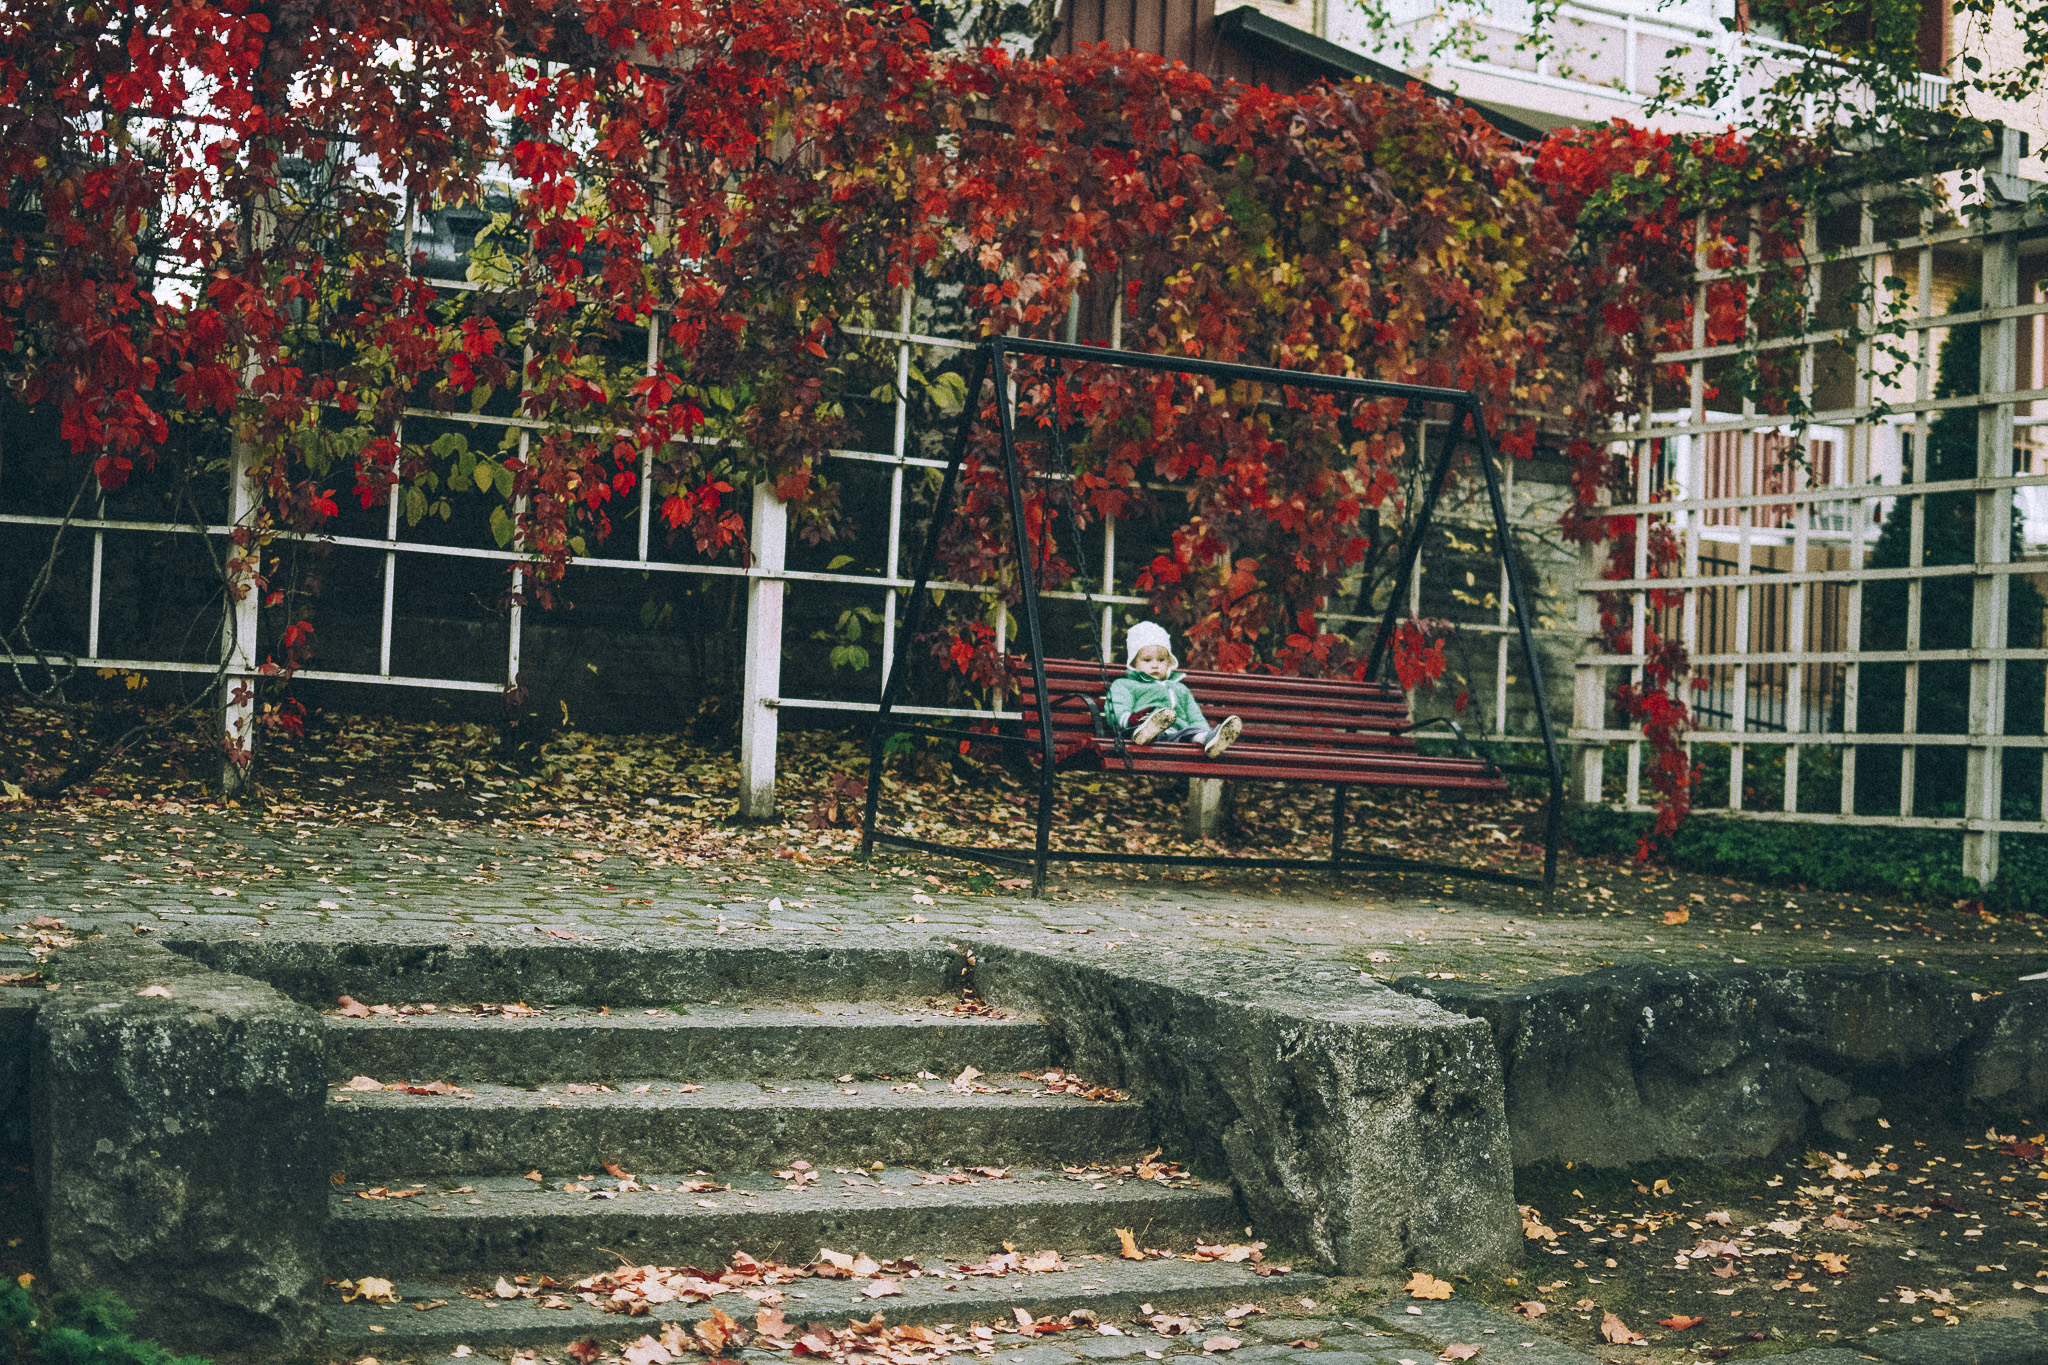 10-02-Spielplatz-fall-22_LR edited_FB.jpg